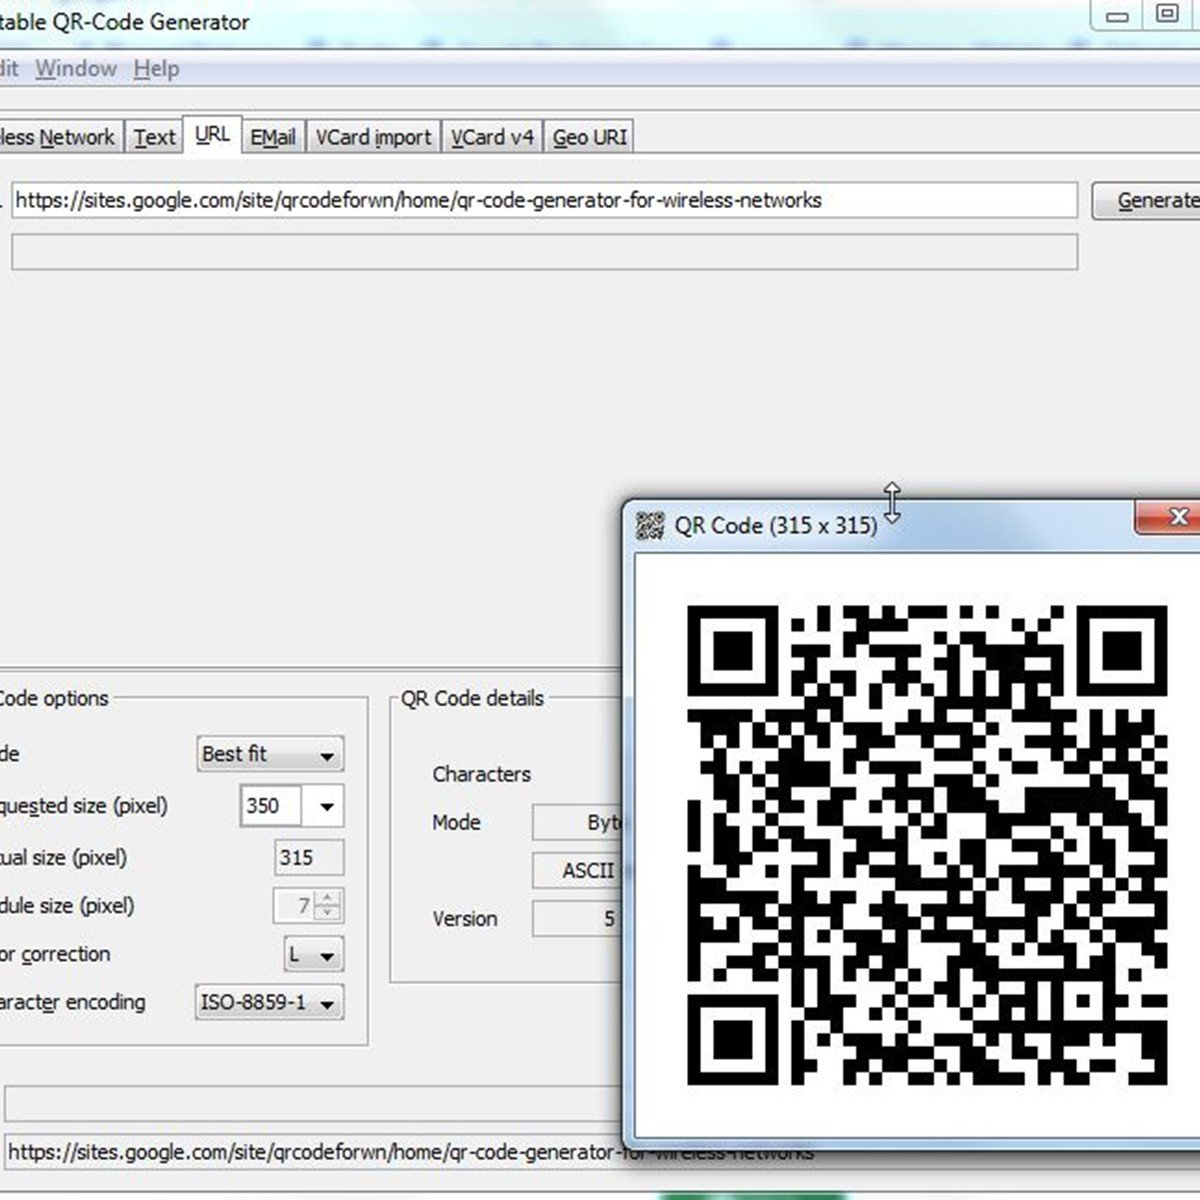 Portable QR-Code Generator Alternatives and Similar Software